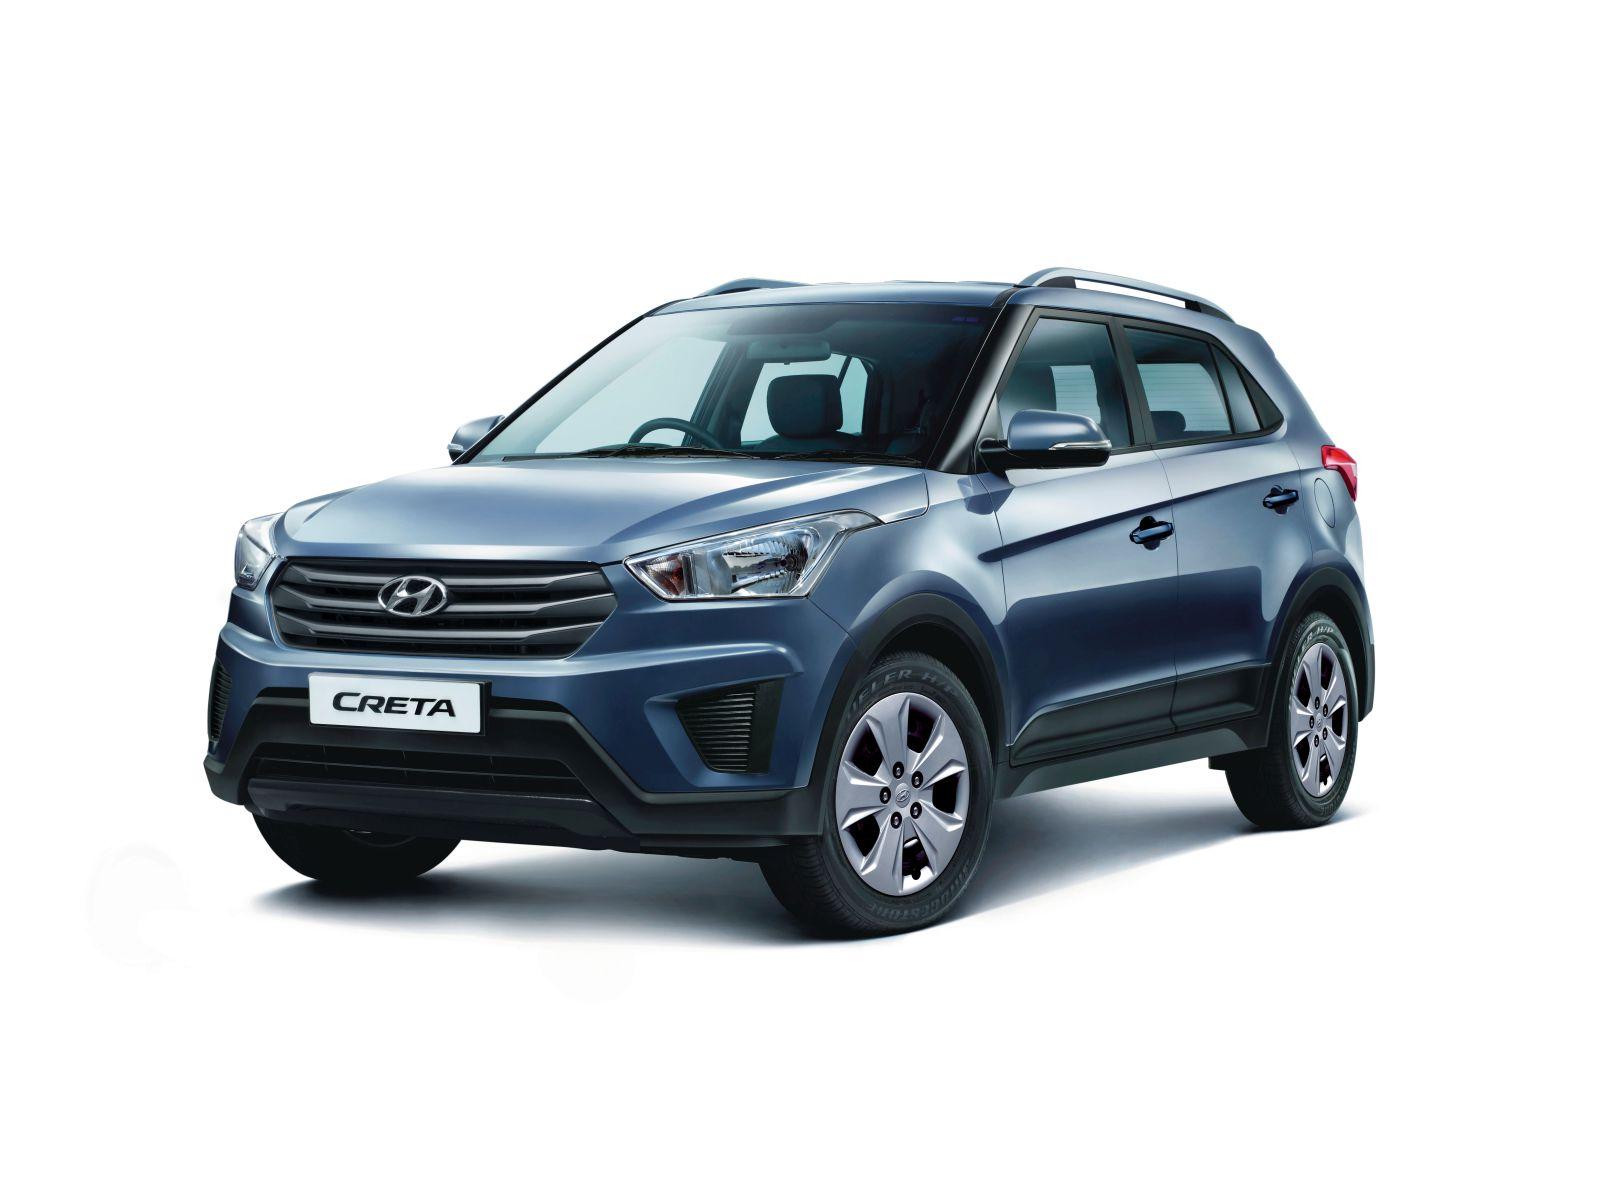 Hyundai Creta special editions (3)